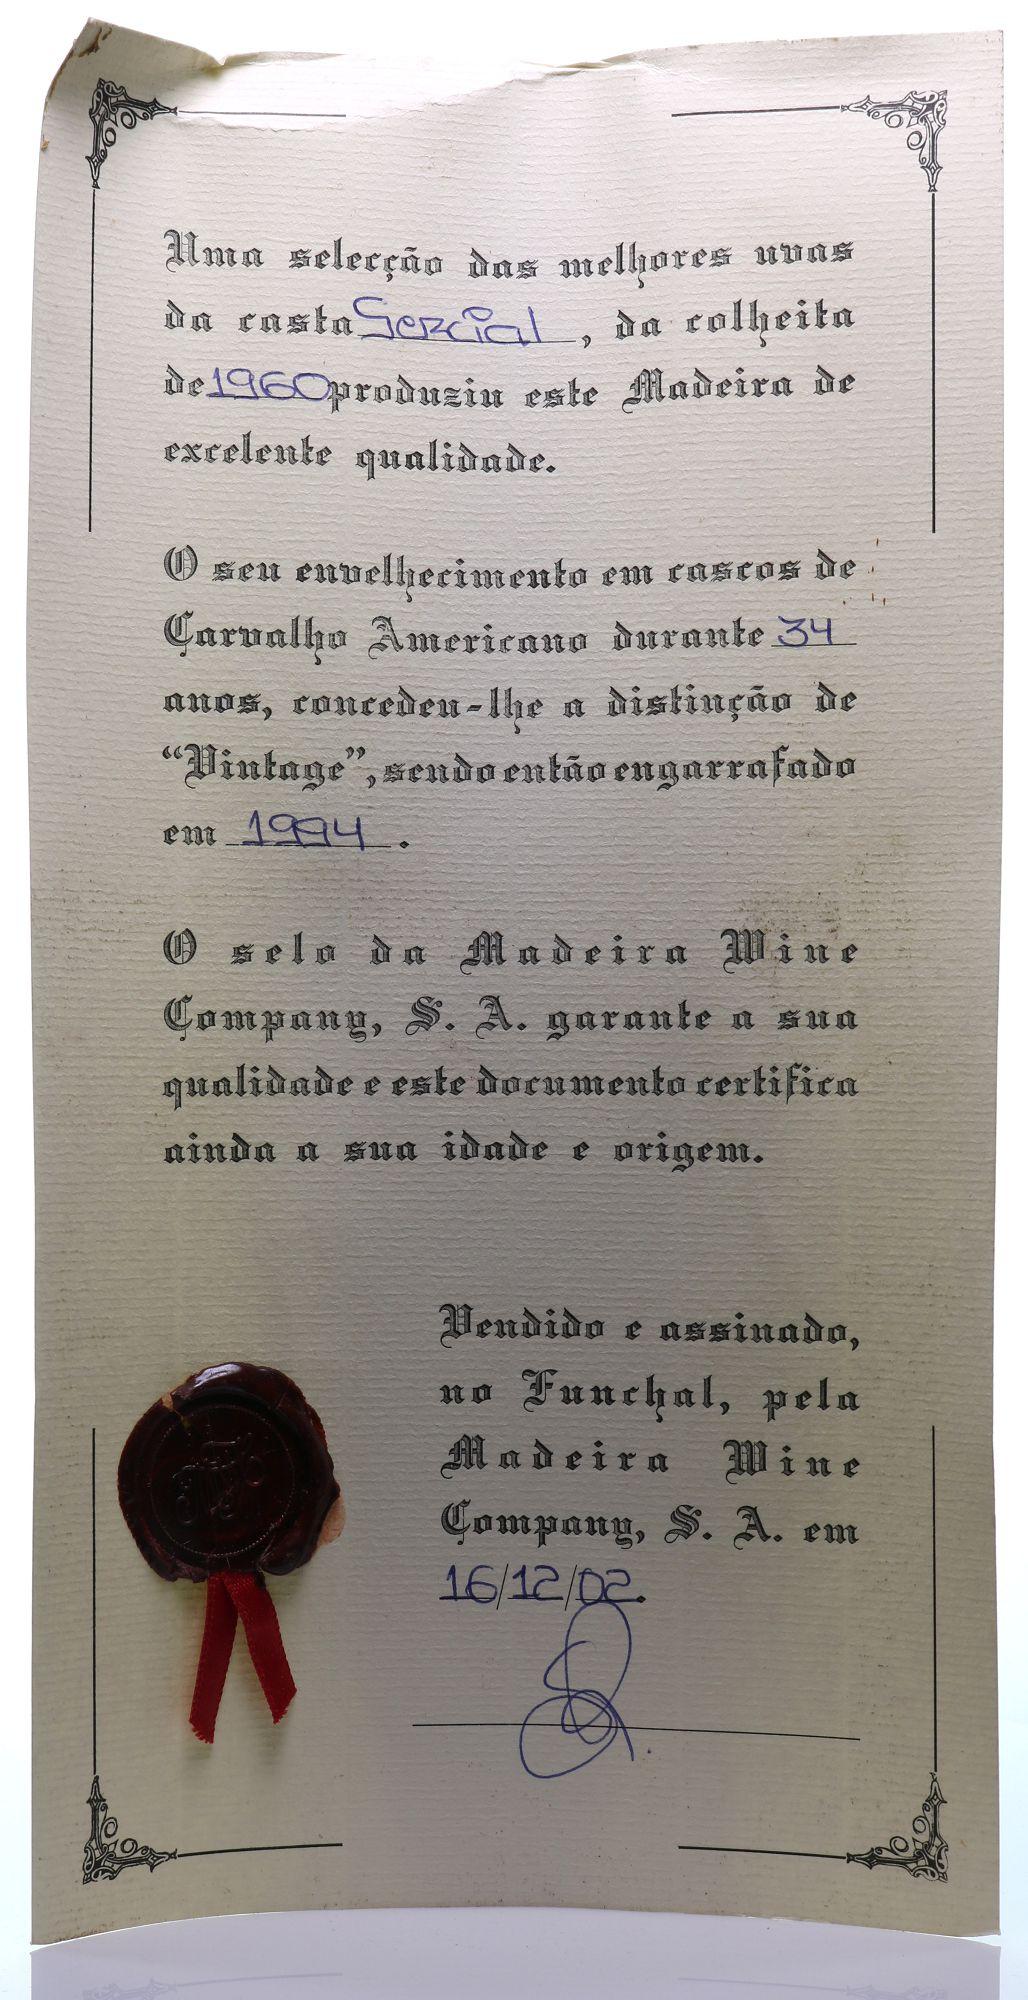 Madeira 1960 Cossart Sercial